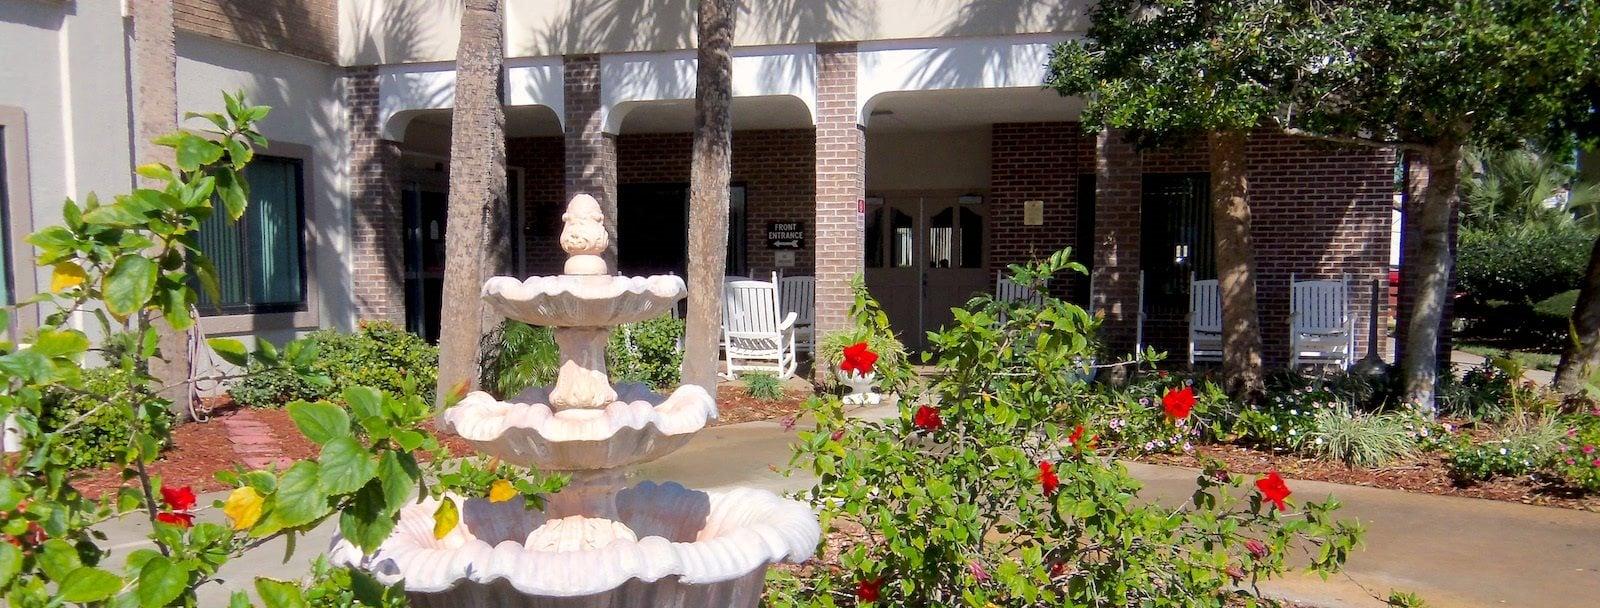 Central Manor Apartments in Daytona Beach, FL exterior